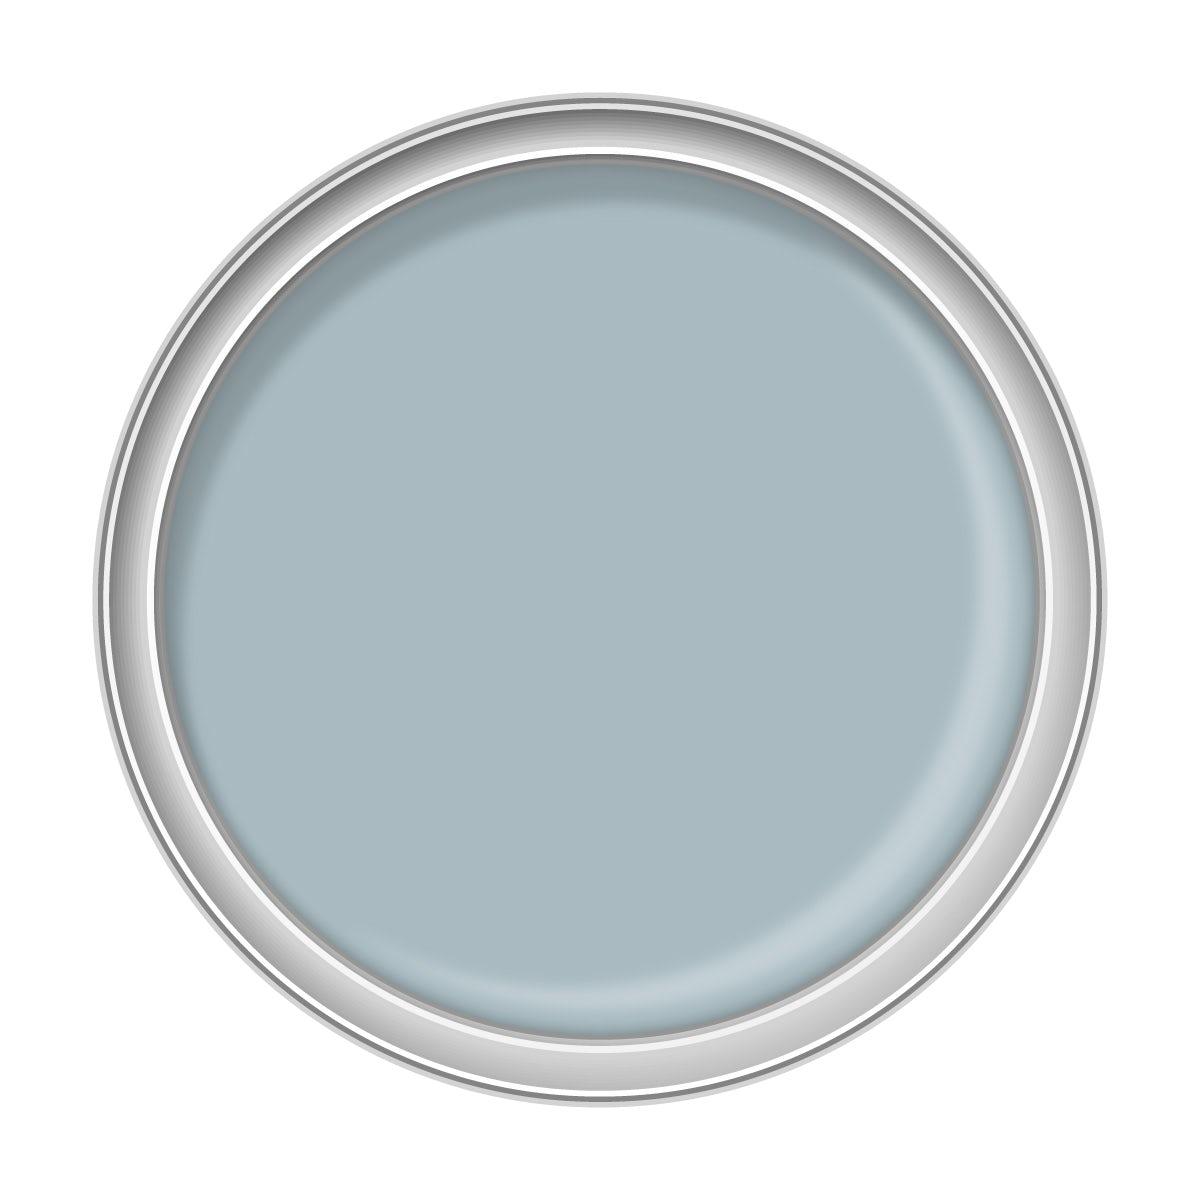 Craig & Rose bluebell dream kitchen & bathroom paint 2.5L